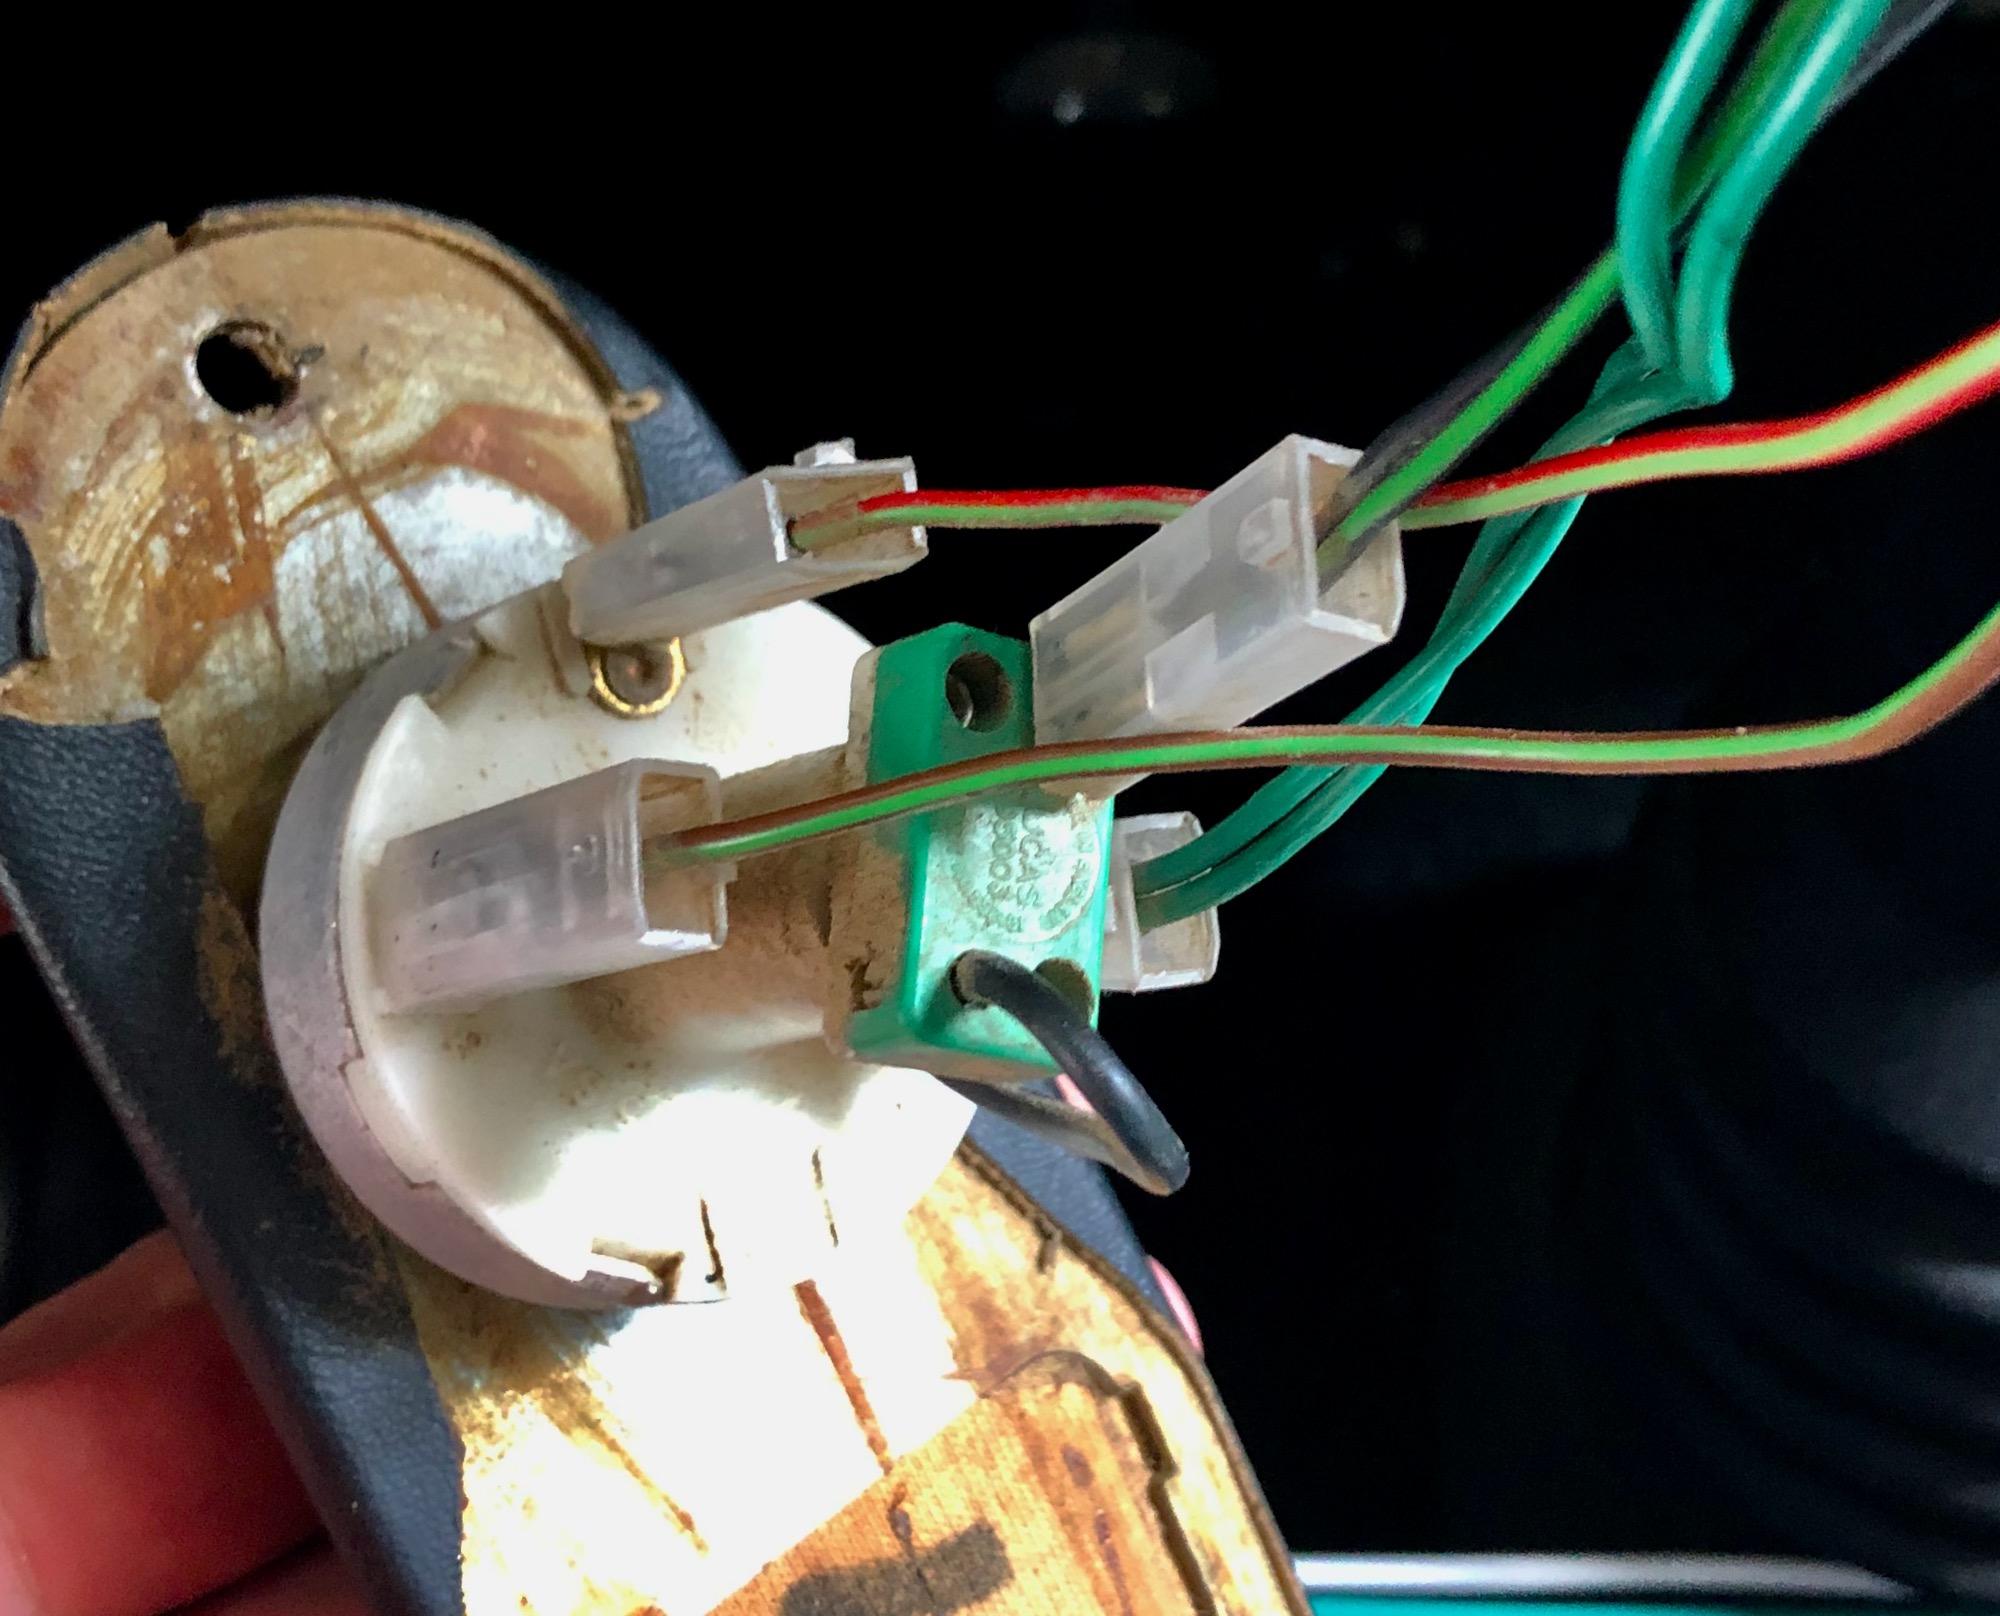 MudStuff Carling Rear Washer/Wiper Switch Wiring | Defender Source Forum | Rear Wiper Switch Wiring Diagram |  | Defender Source